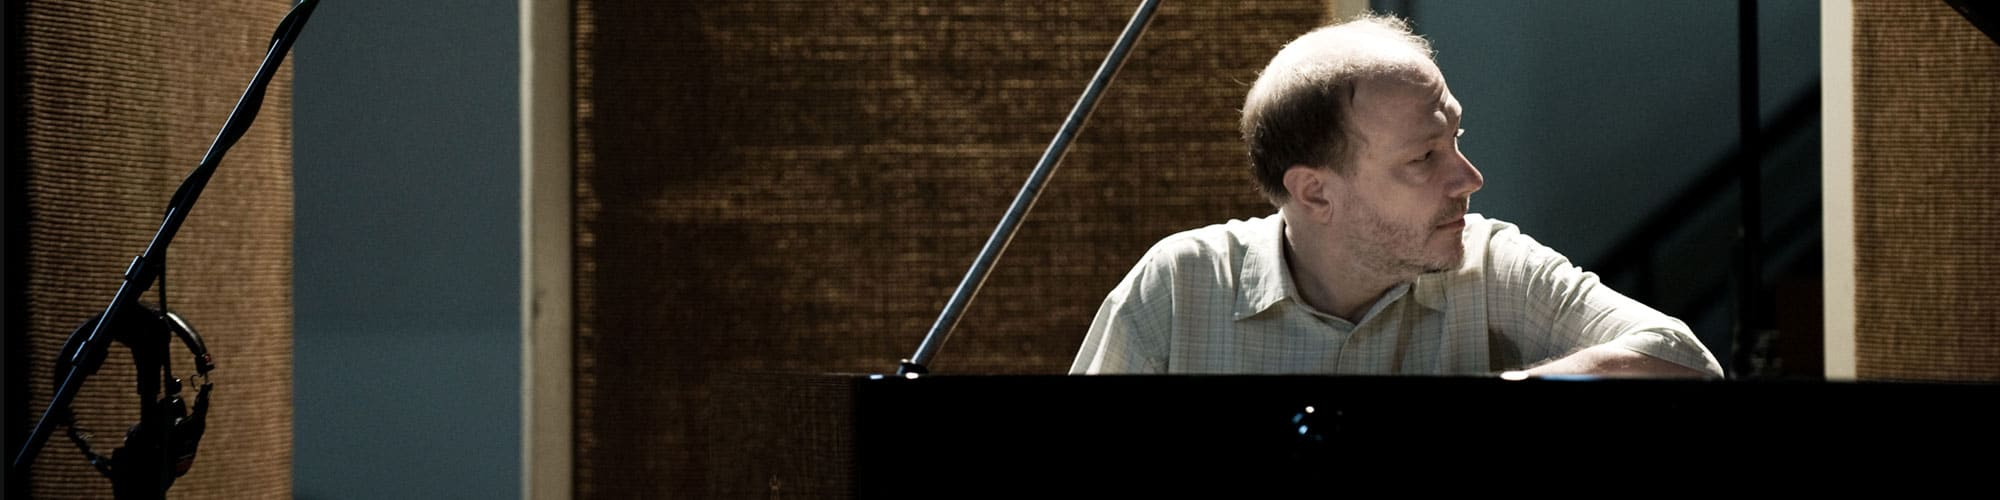 Marc-André Hamelin, piano. Foto Sim Canetty Clarke